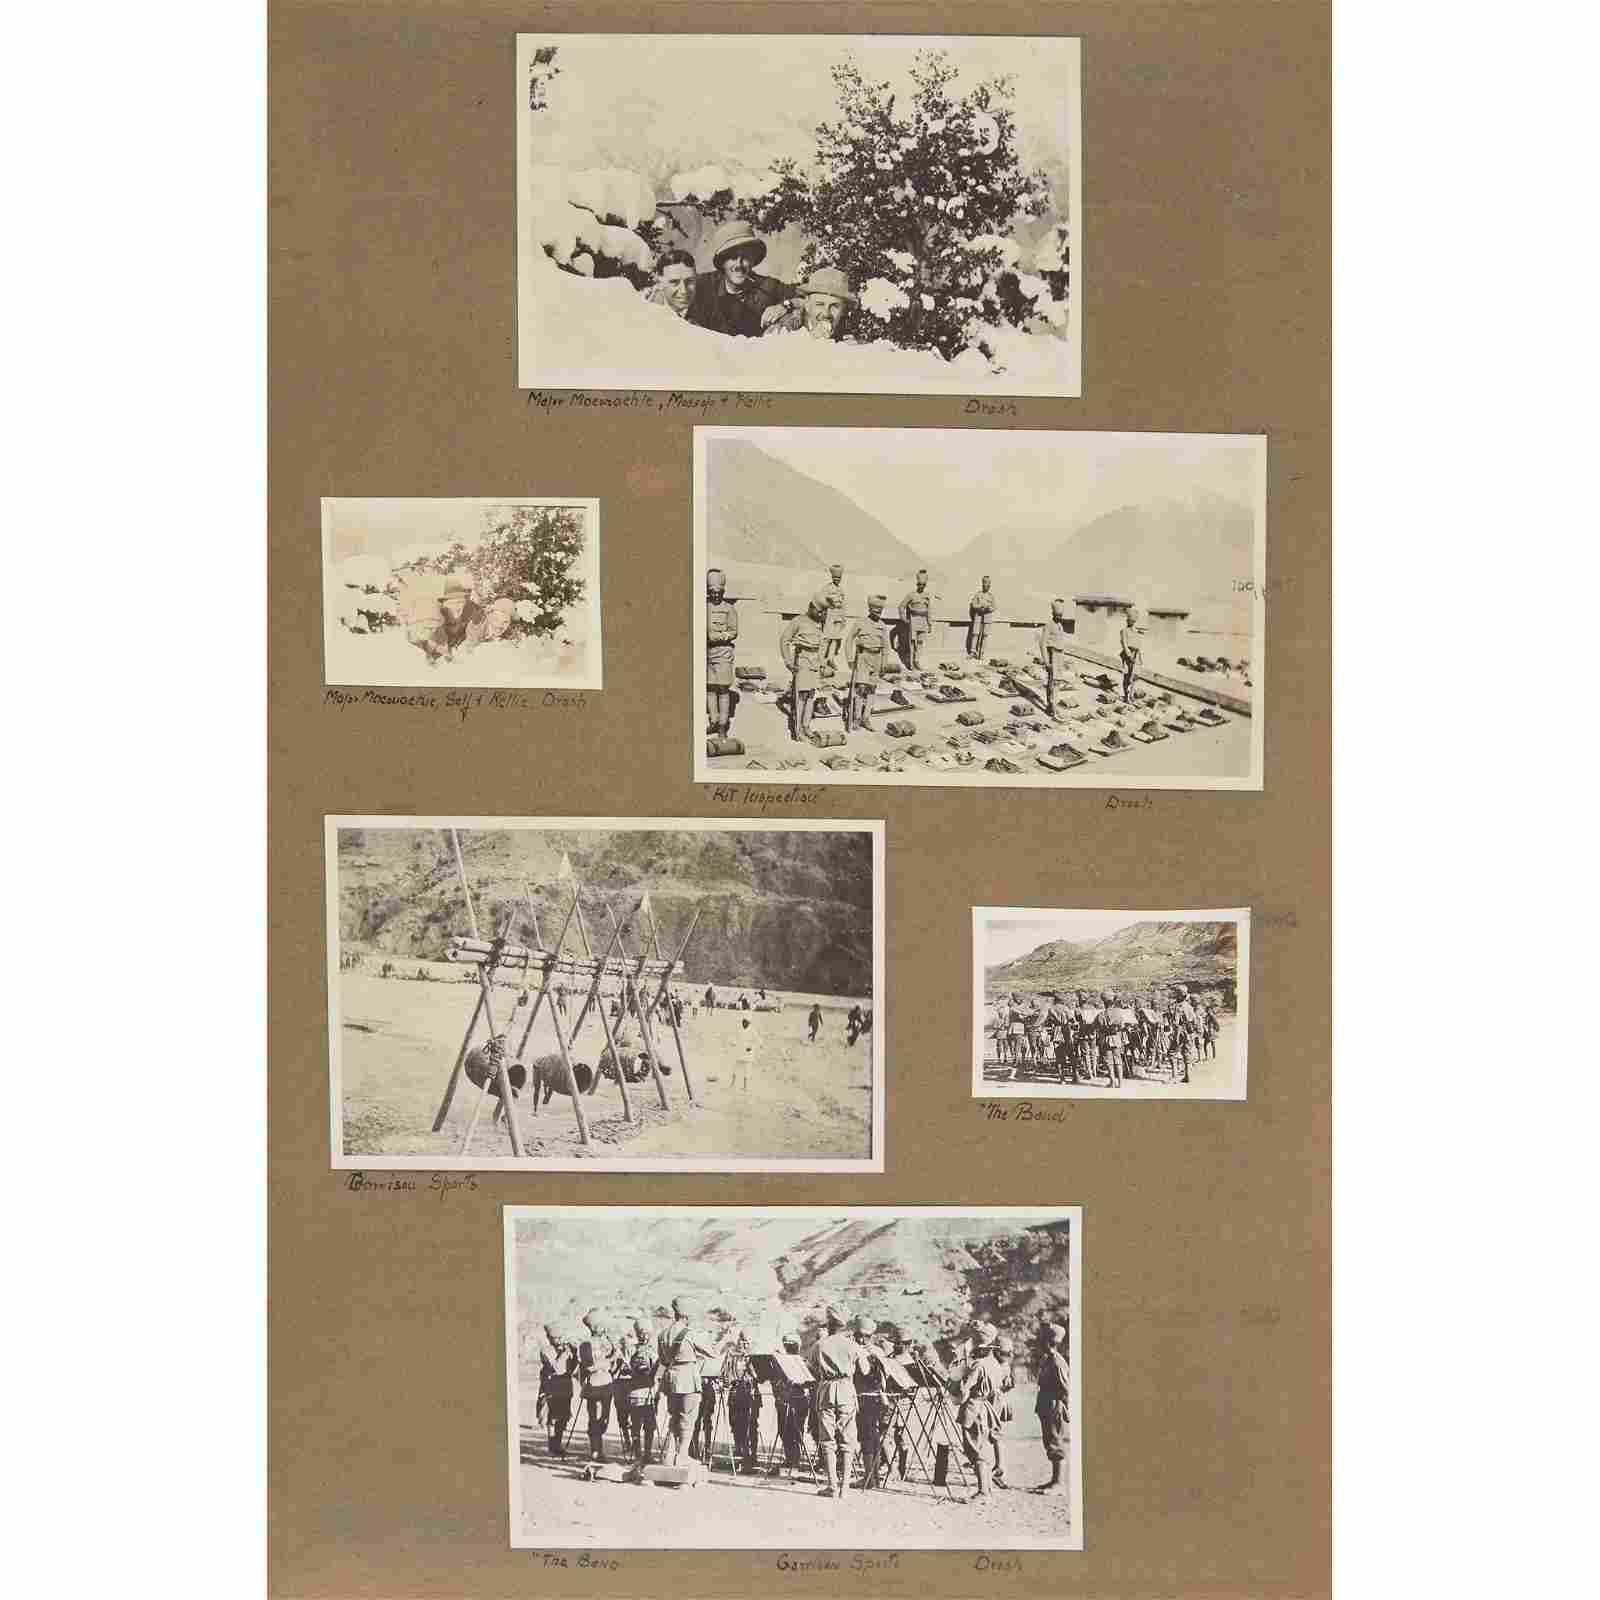 India pre 1947 (now Pakistan): photographs 1915 - 1918